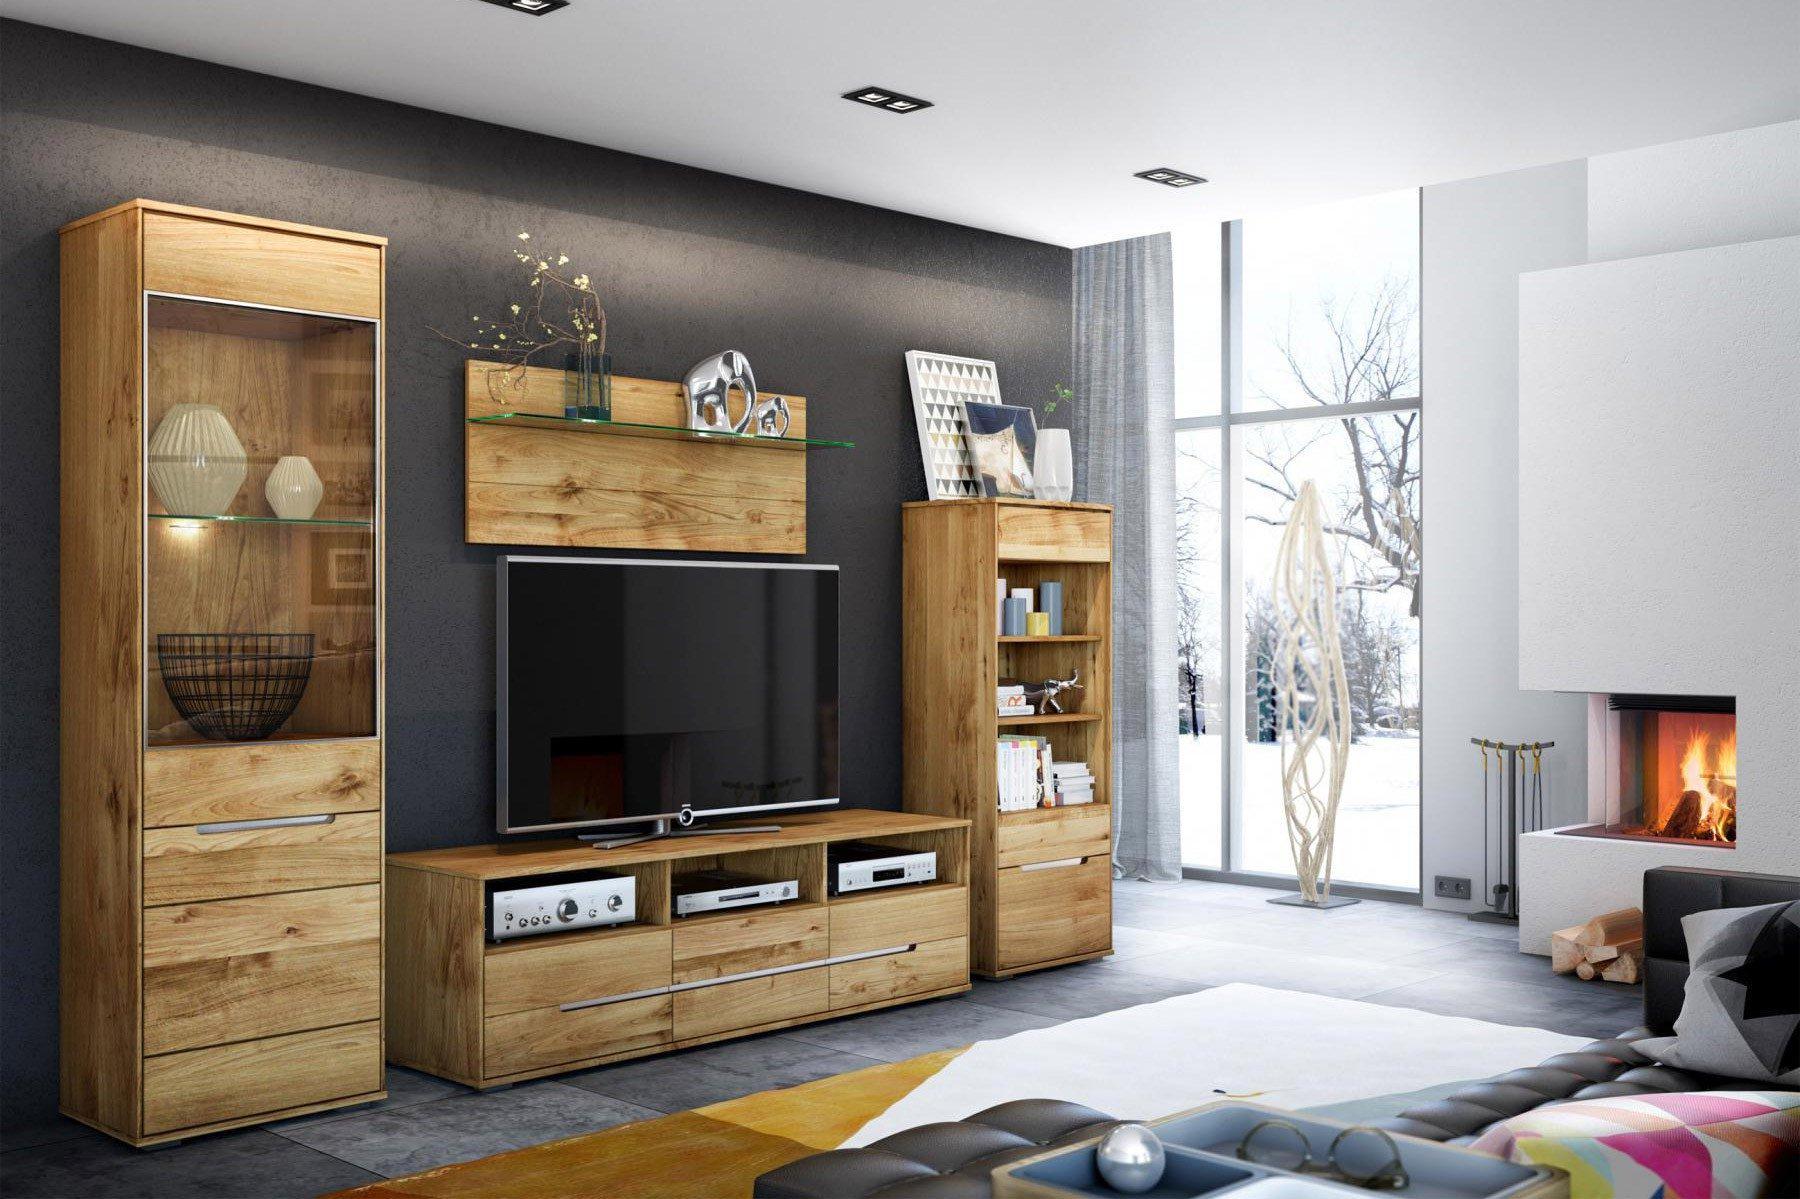 elfo m bel wohnwand lissy wildeiche ge lt m bel letz. Black Bedroom Furniture Sets. Home Design Ideas